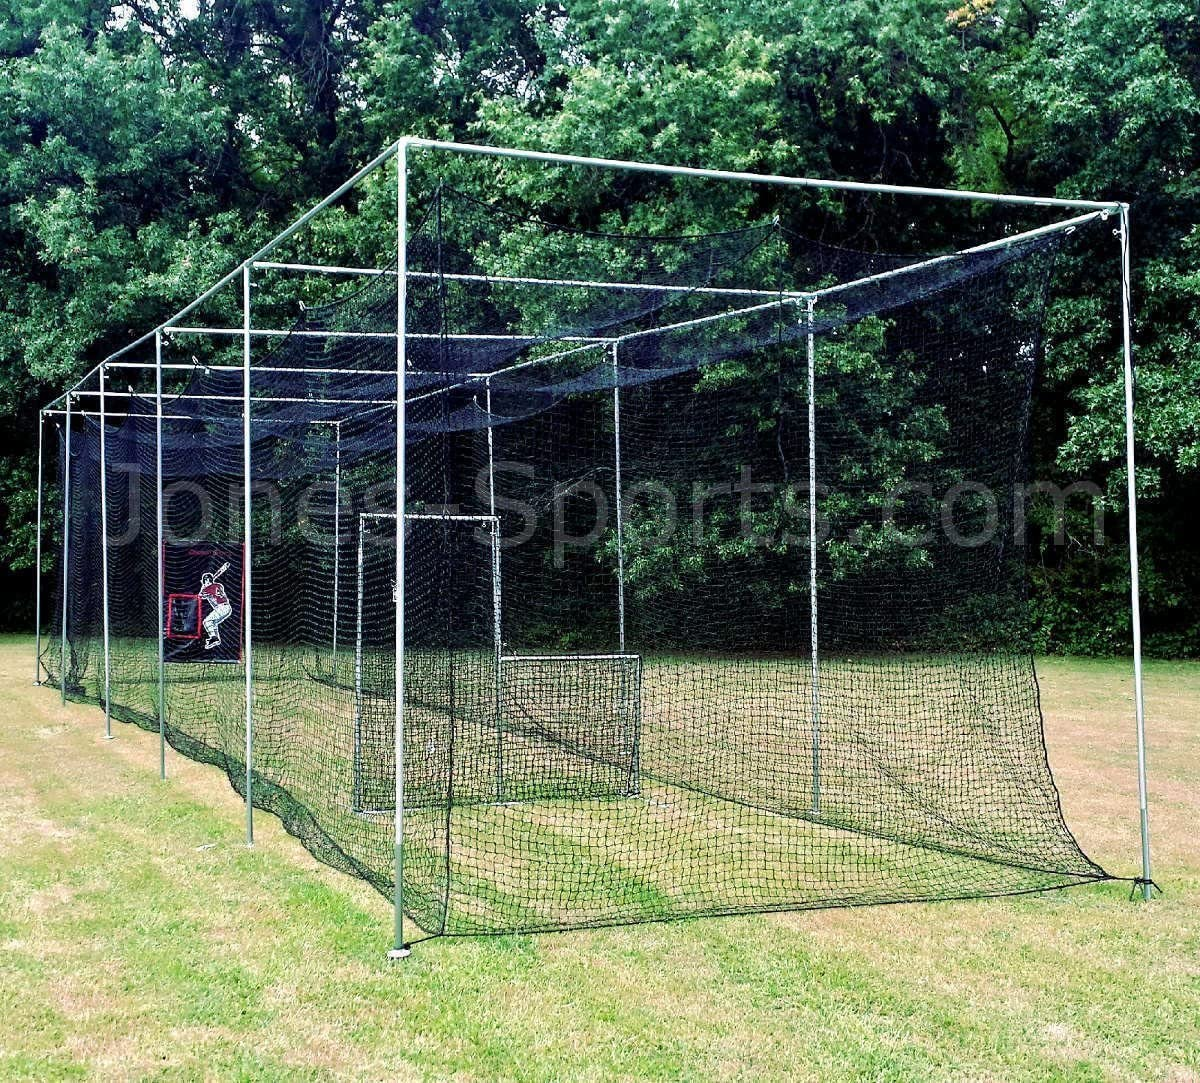 Jones Sports Batting Cage Net 10 H x 12 W x 30 L 42 HDPE 60PLY with Door Heavy Duty Baseball